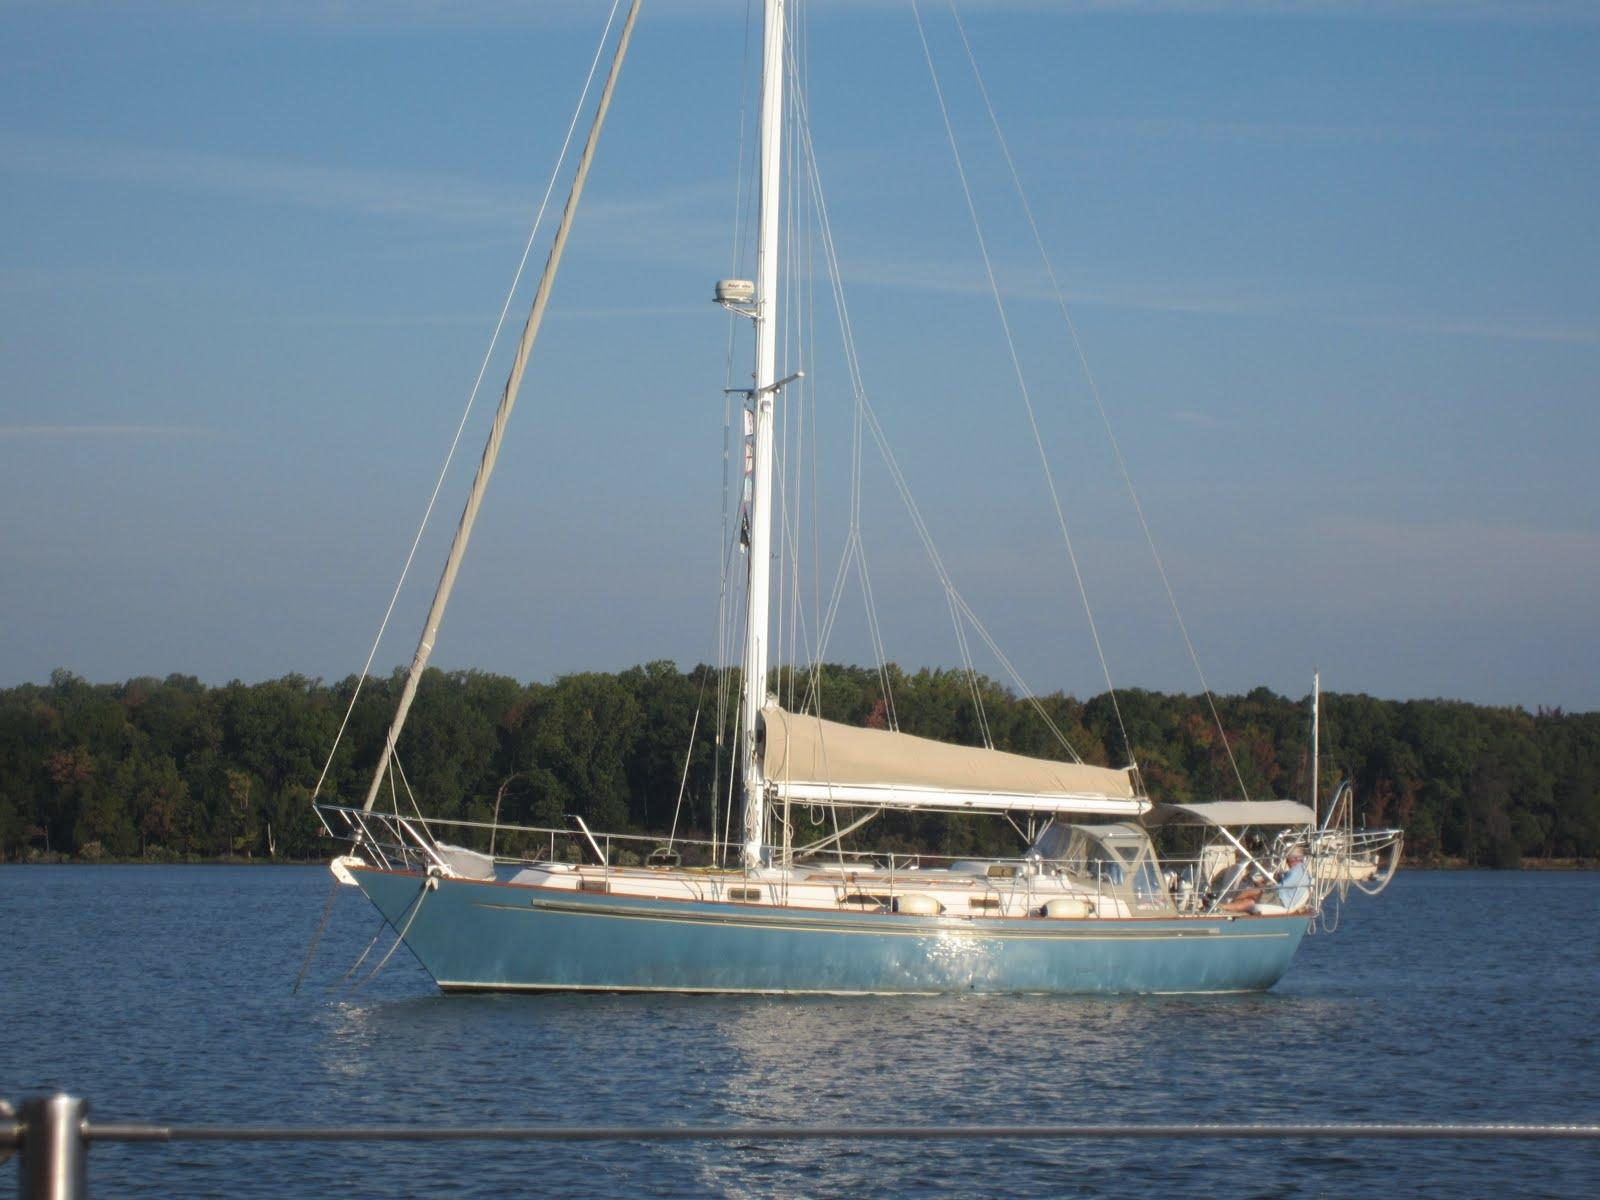 1984 Passport 40 Sail Boat For Sale Wwwyachtworldcom